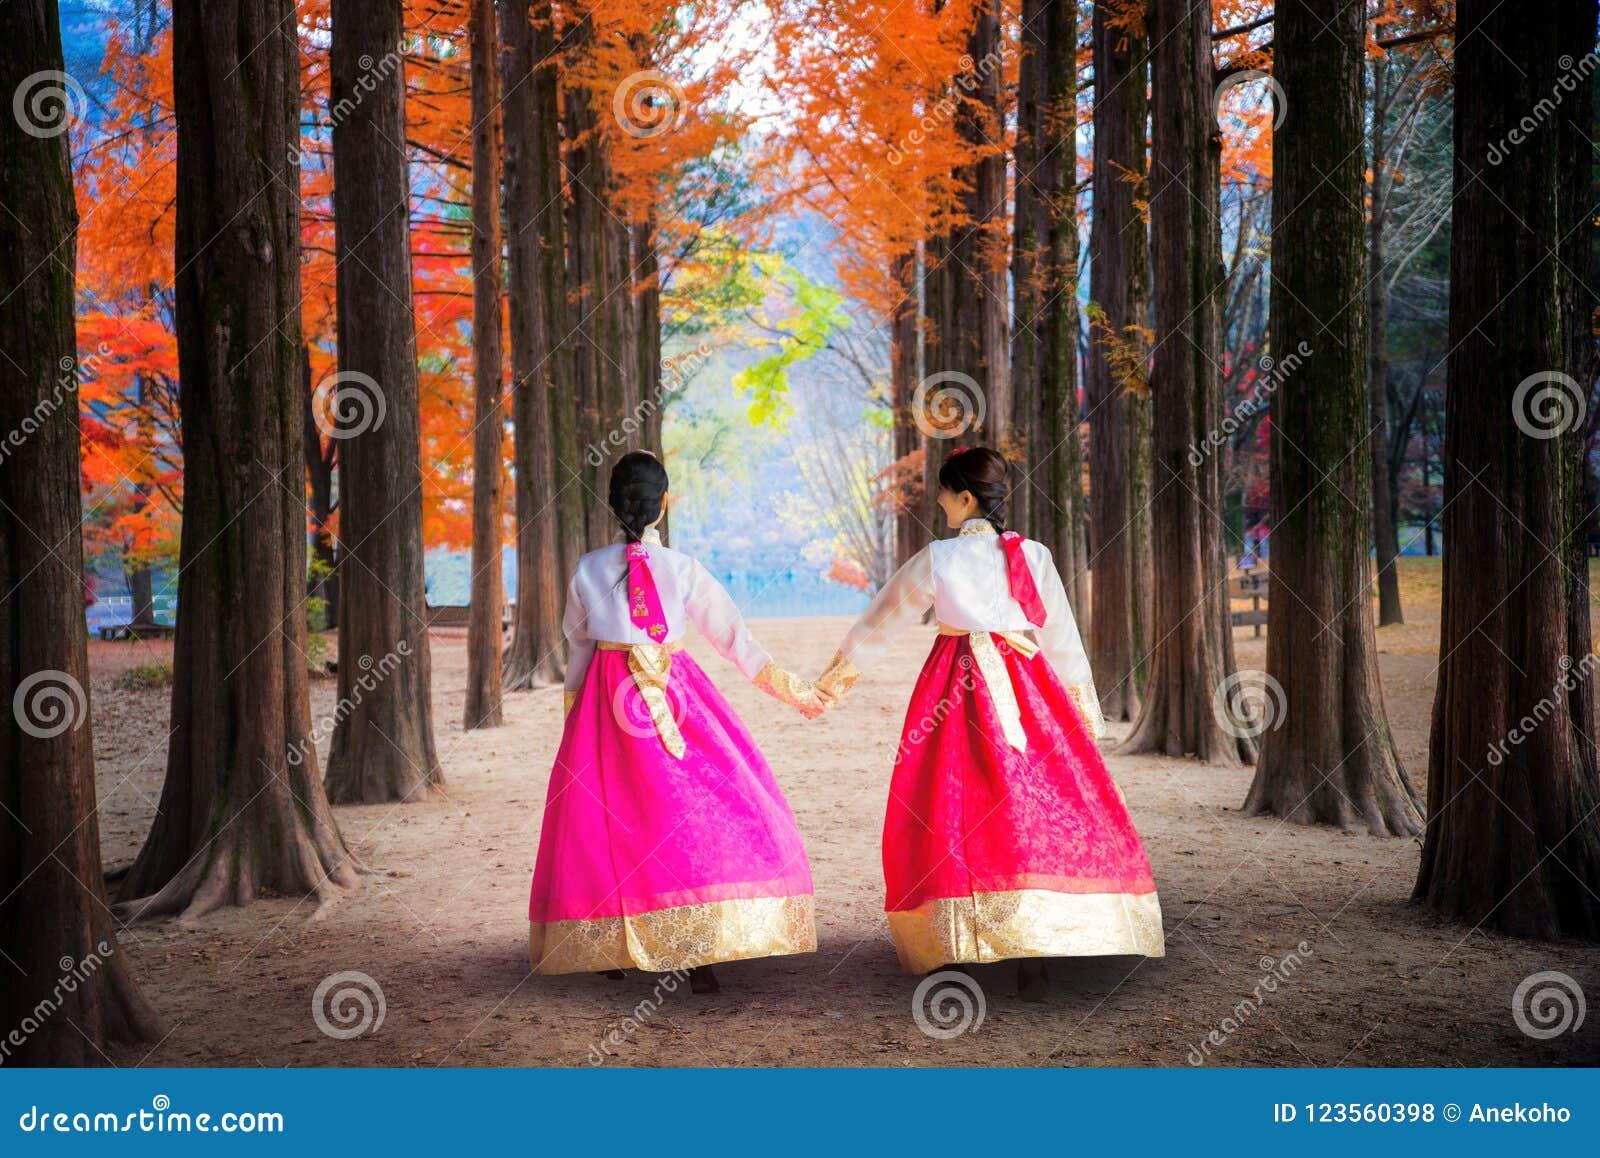 Koreaans meisje die in namipark lopen in namieiland